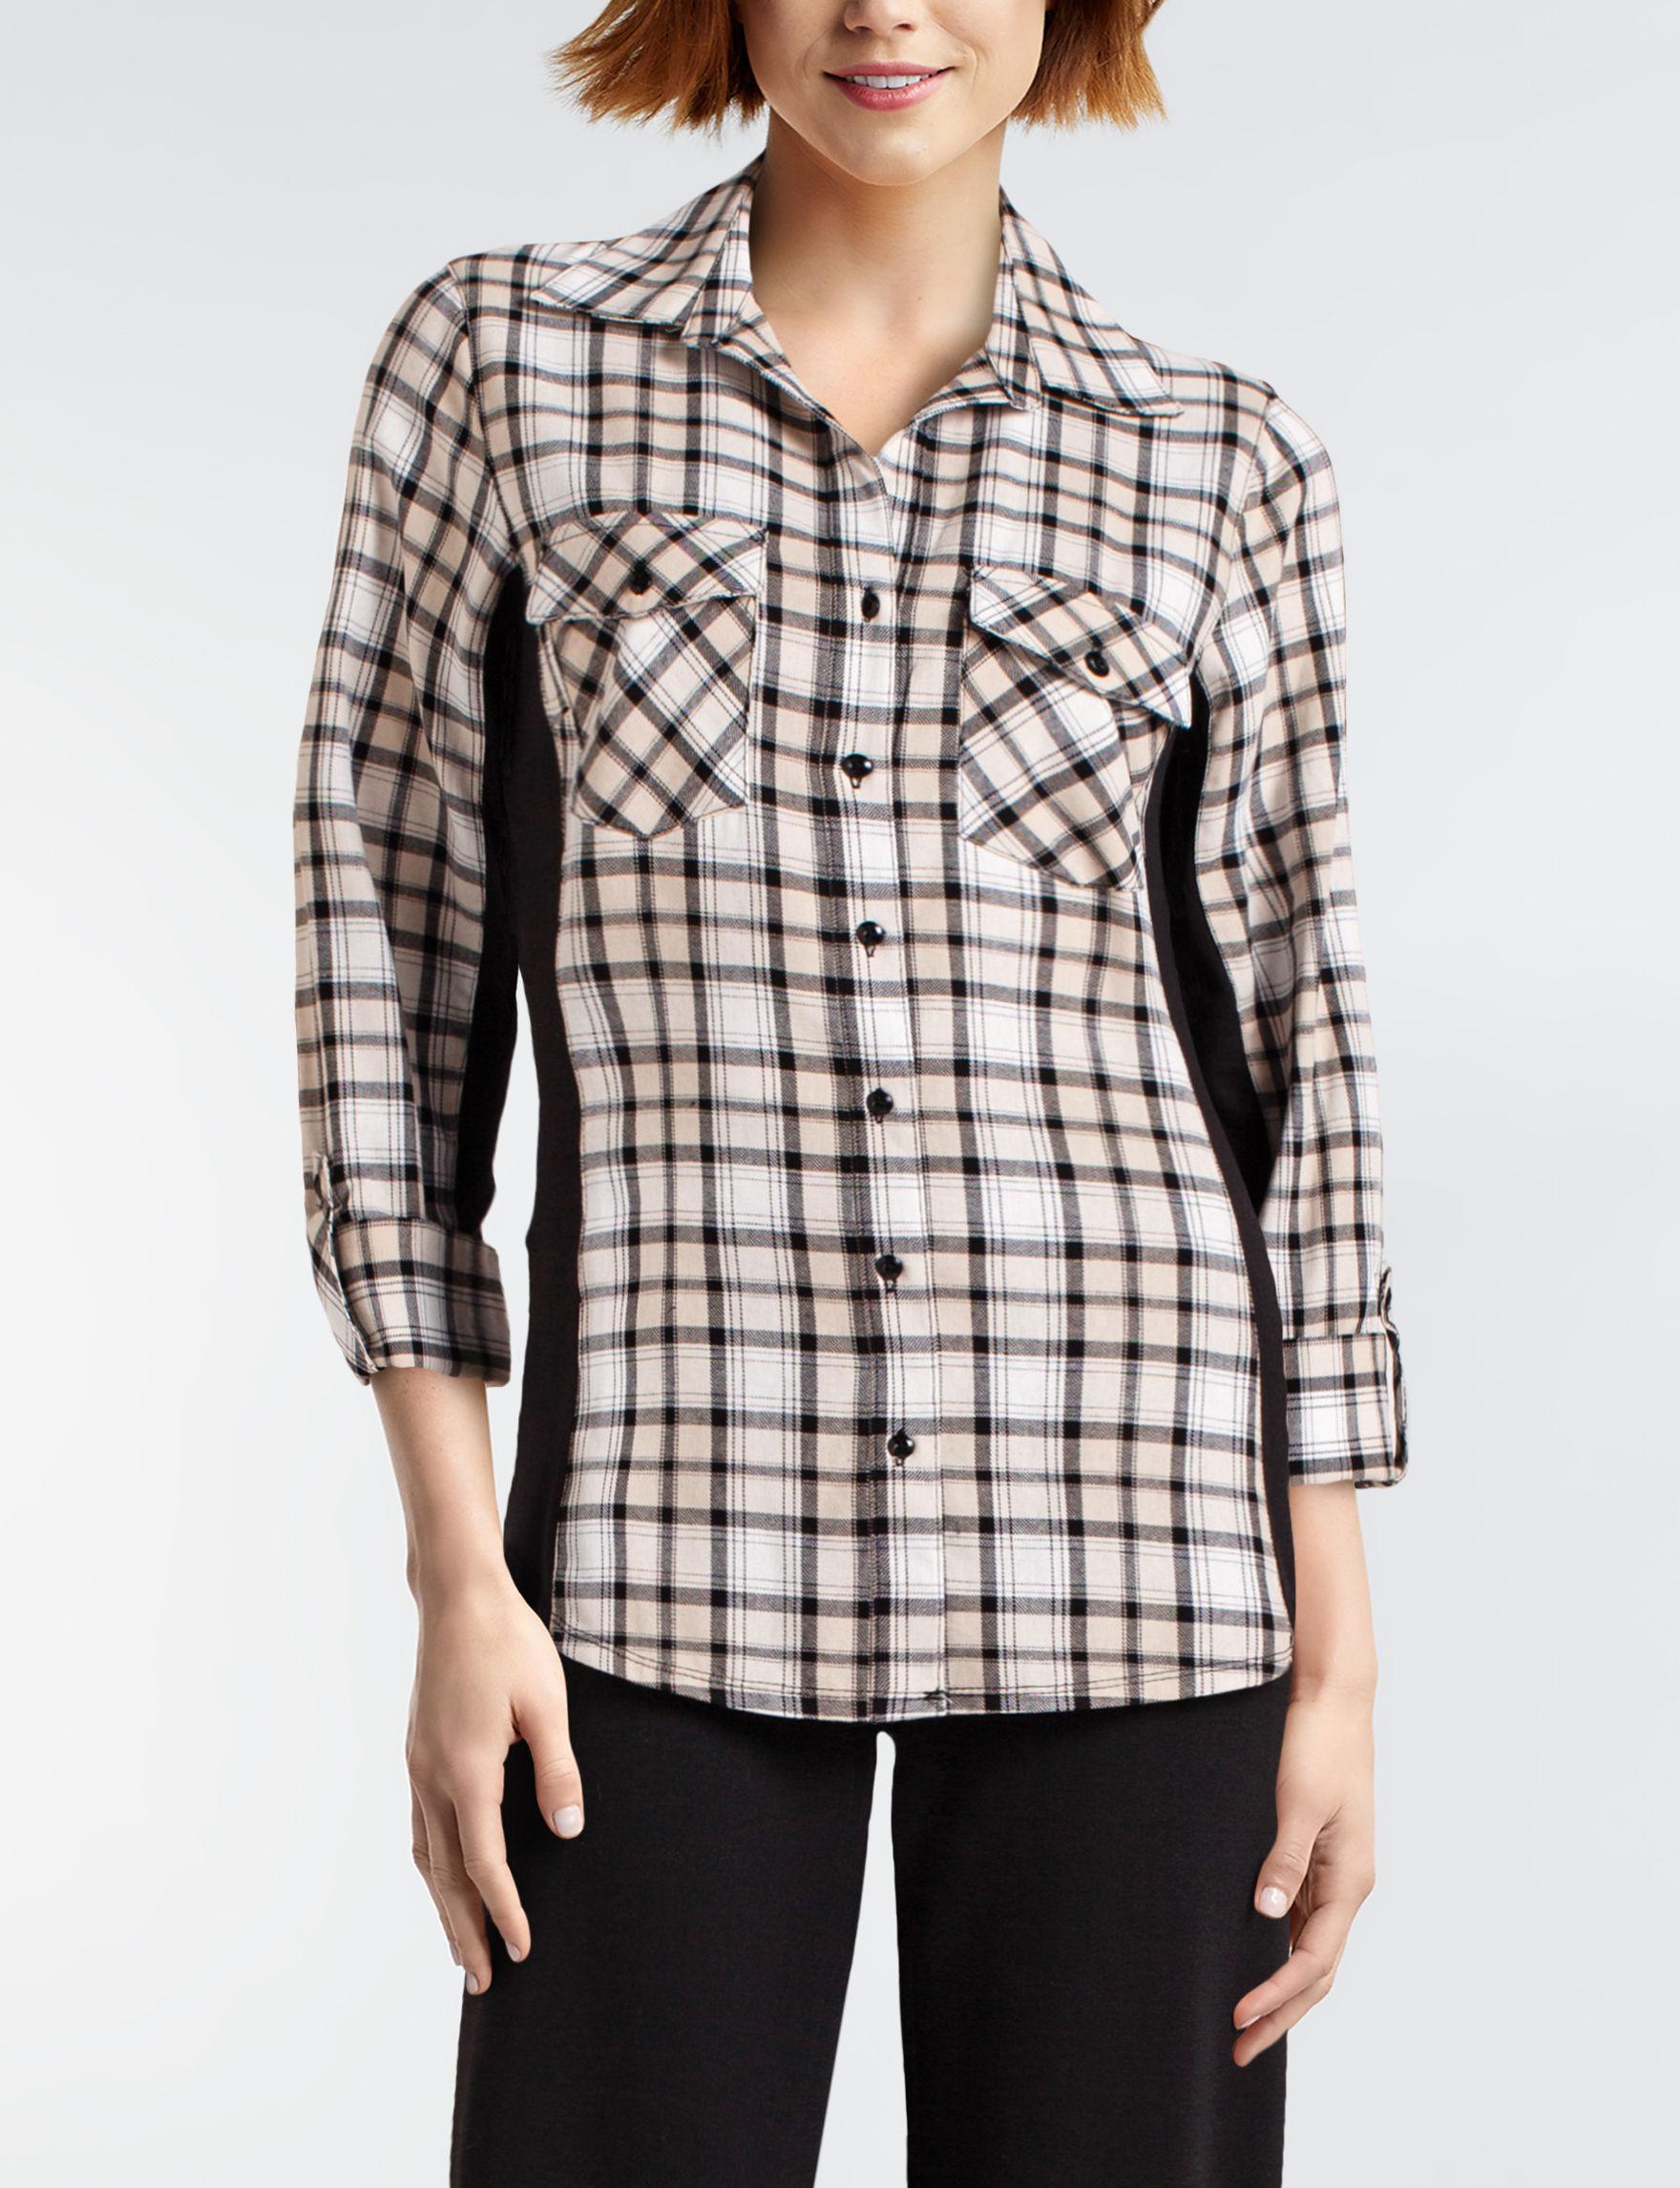 Zac & Rachel Beige / Multi Shirts & Blouses